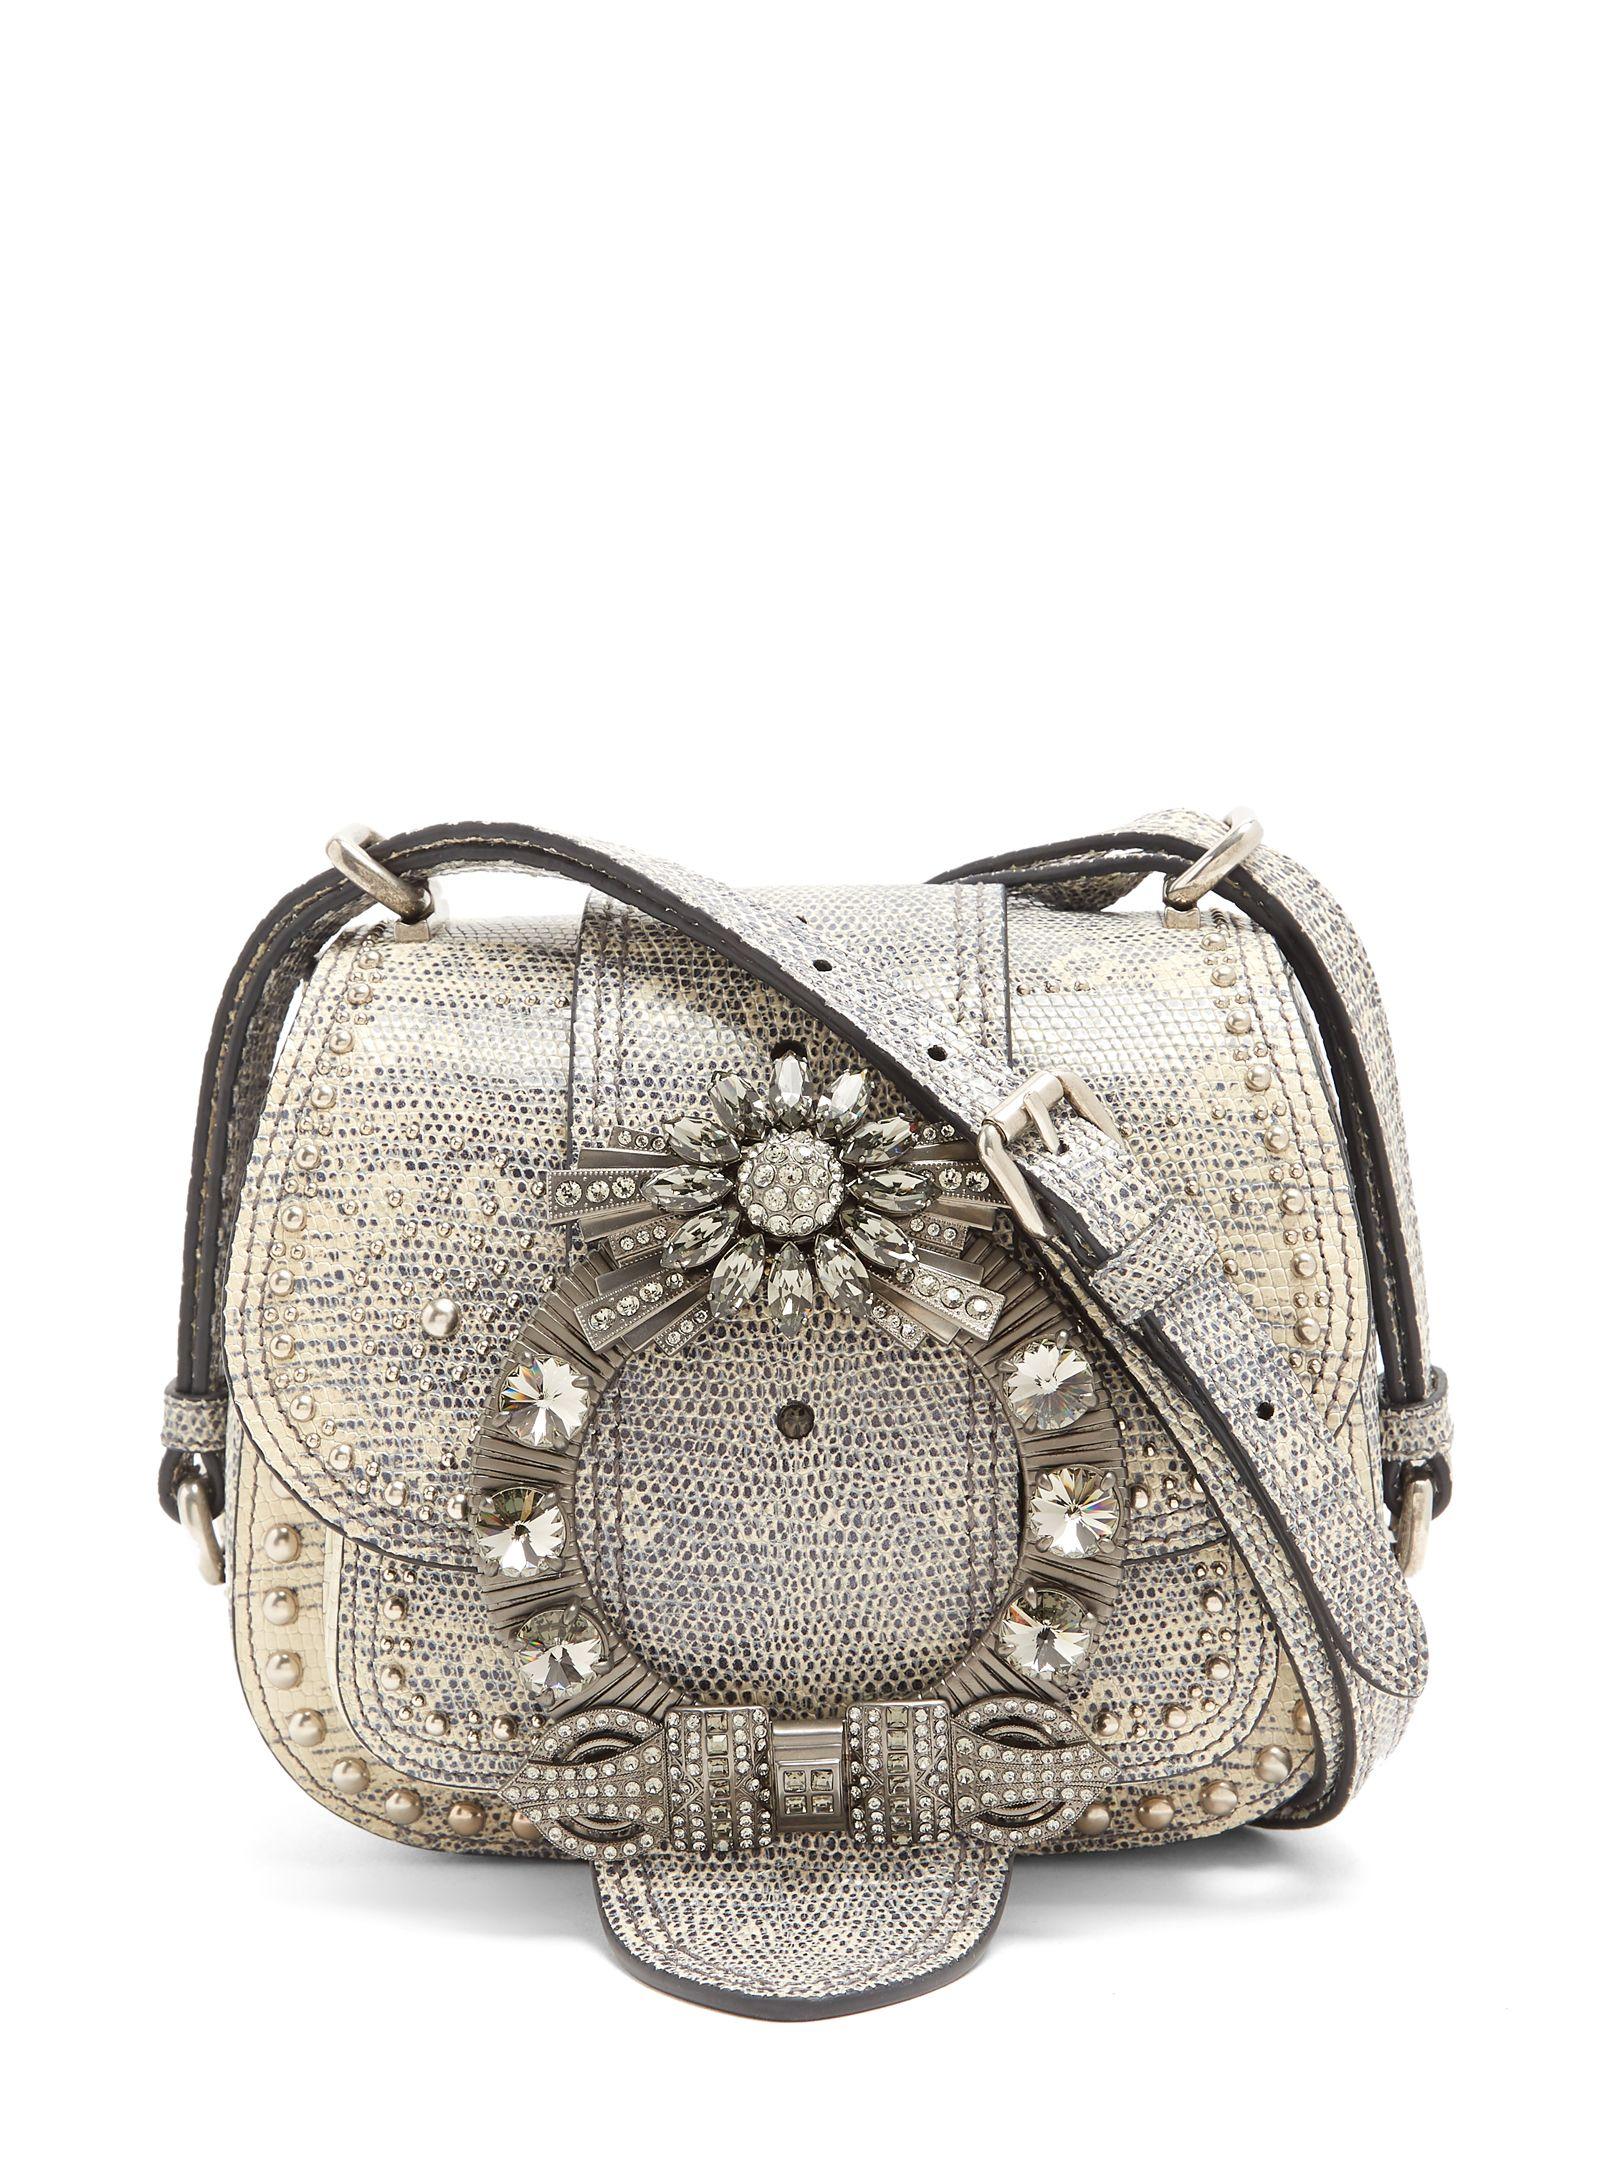 089d9cb152dc MIU MIU Dahlia embellished leather cross-body bag